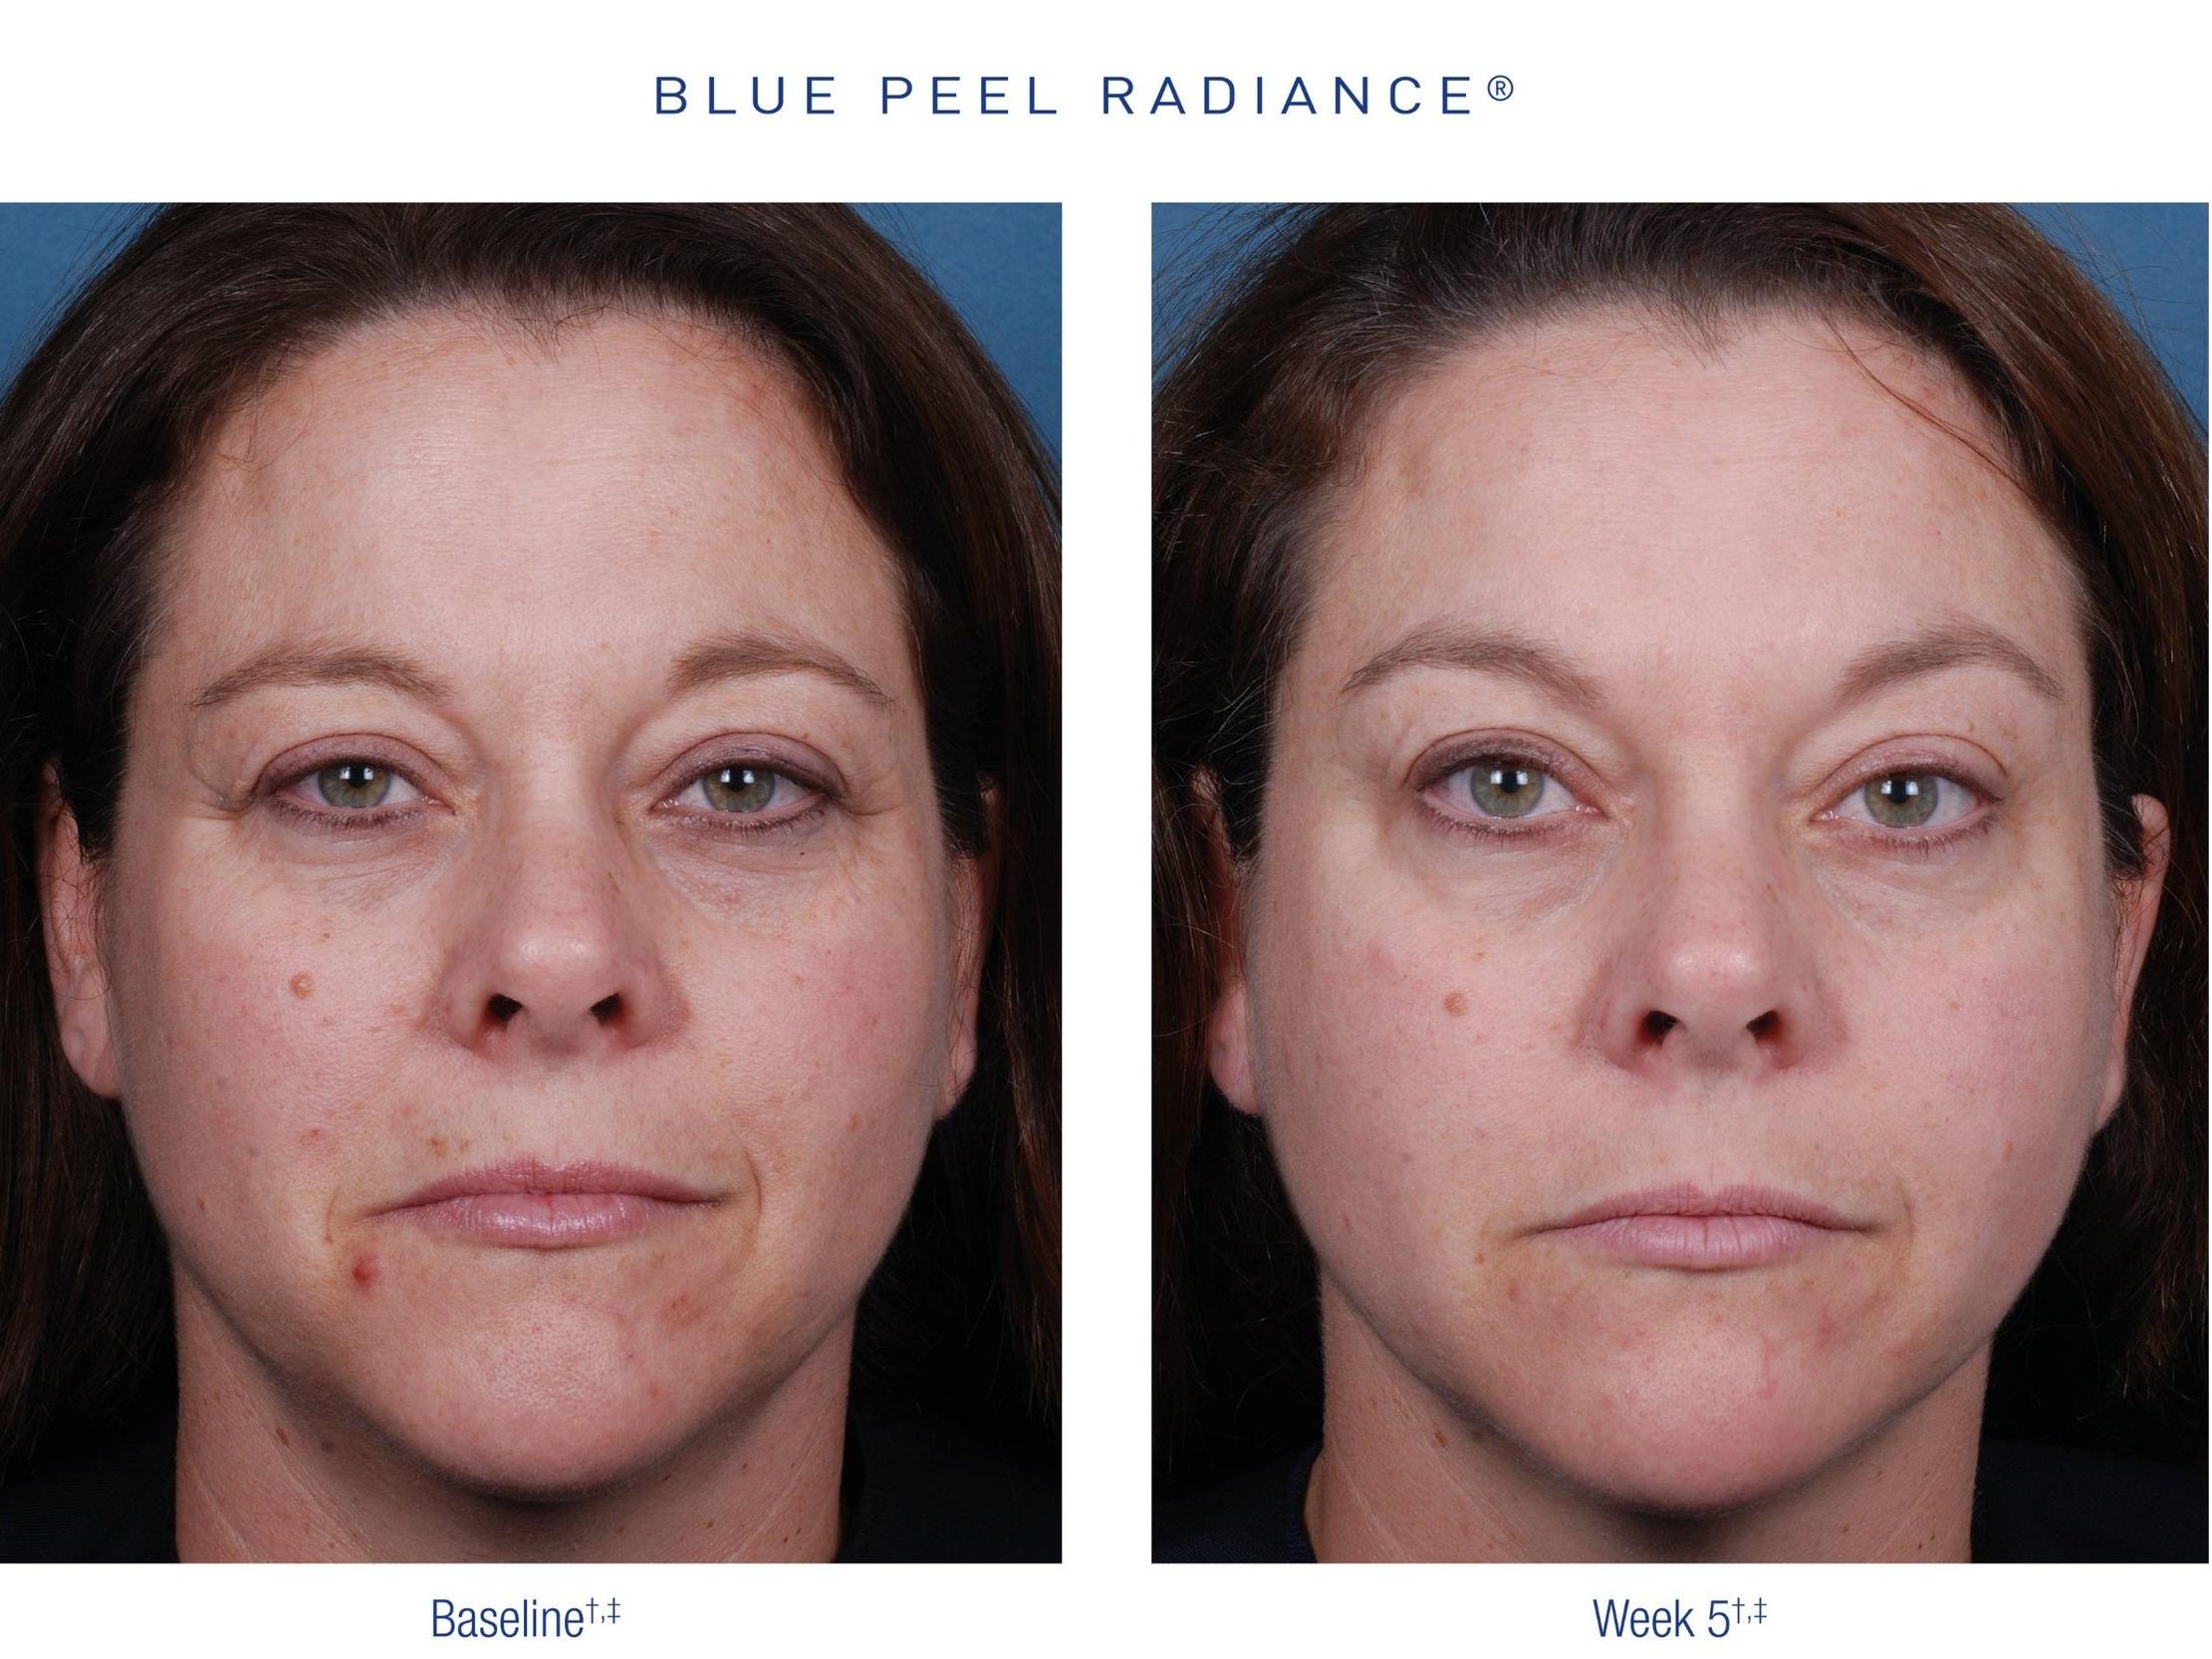 CHEMICALPEEL_BLUEPEEL_OBAGI_Before&After2.png.jpg